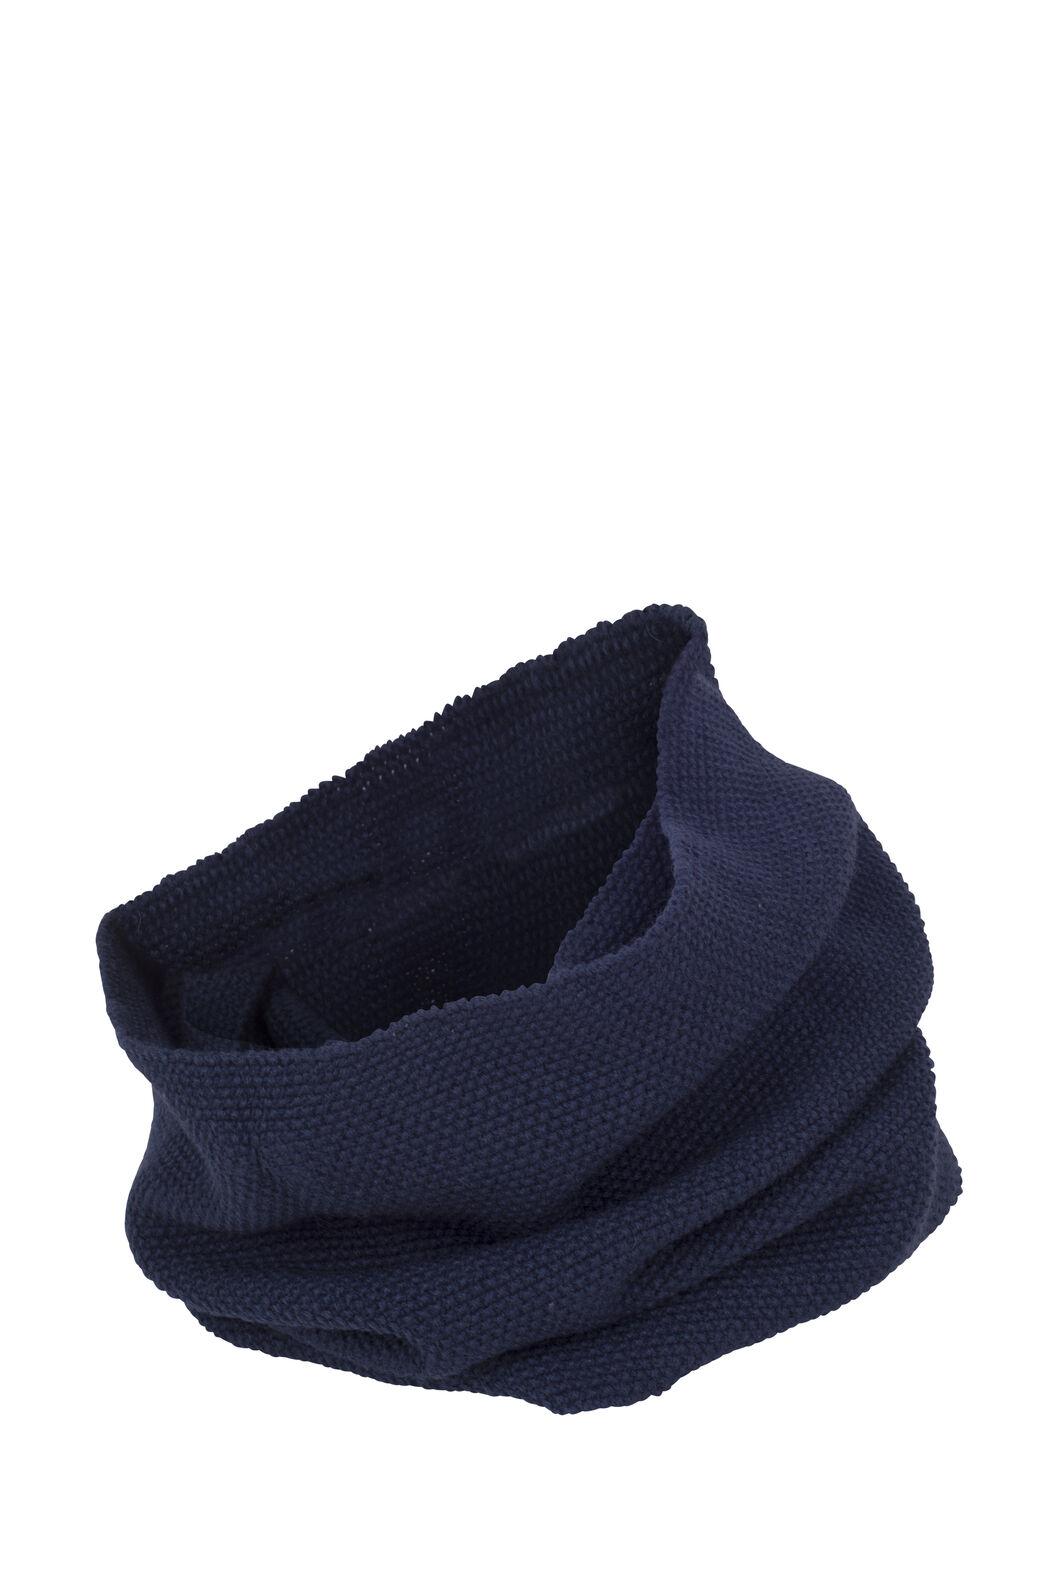 Macpac Pearl Knit Infinity Scarf, Black Iris, hi-res